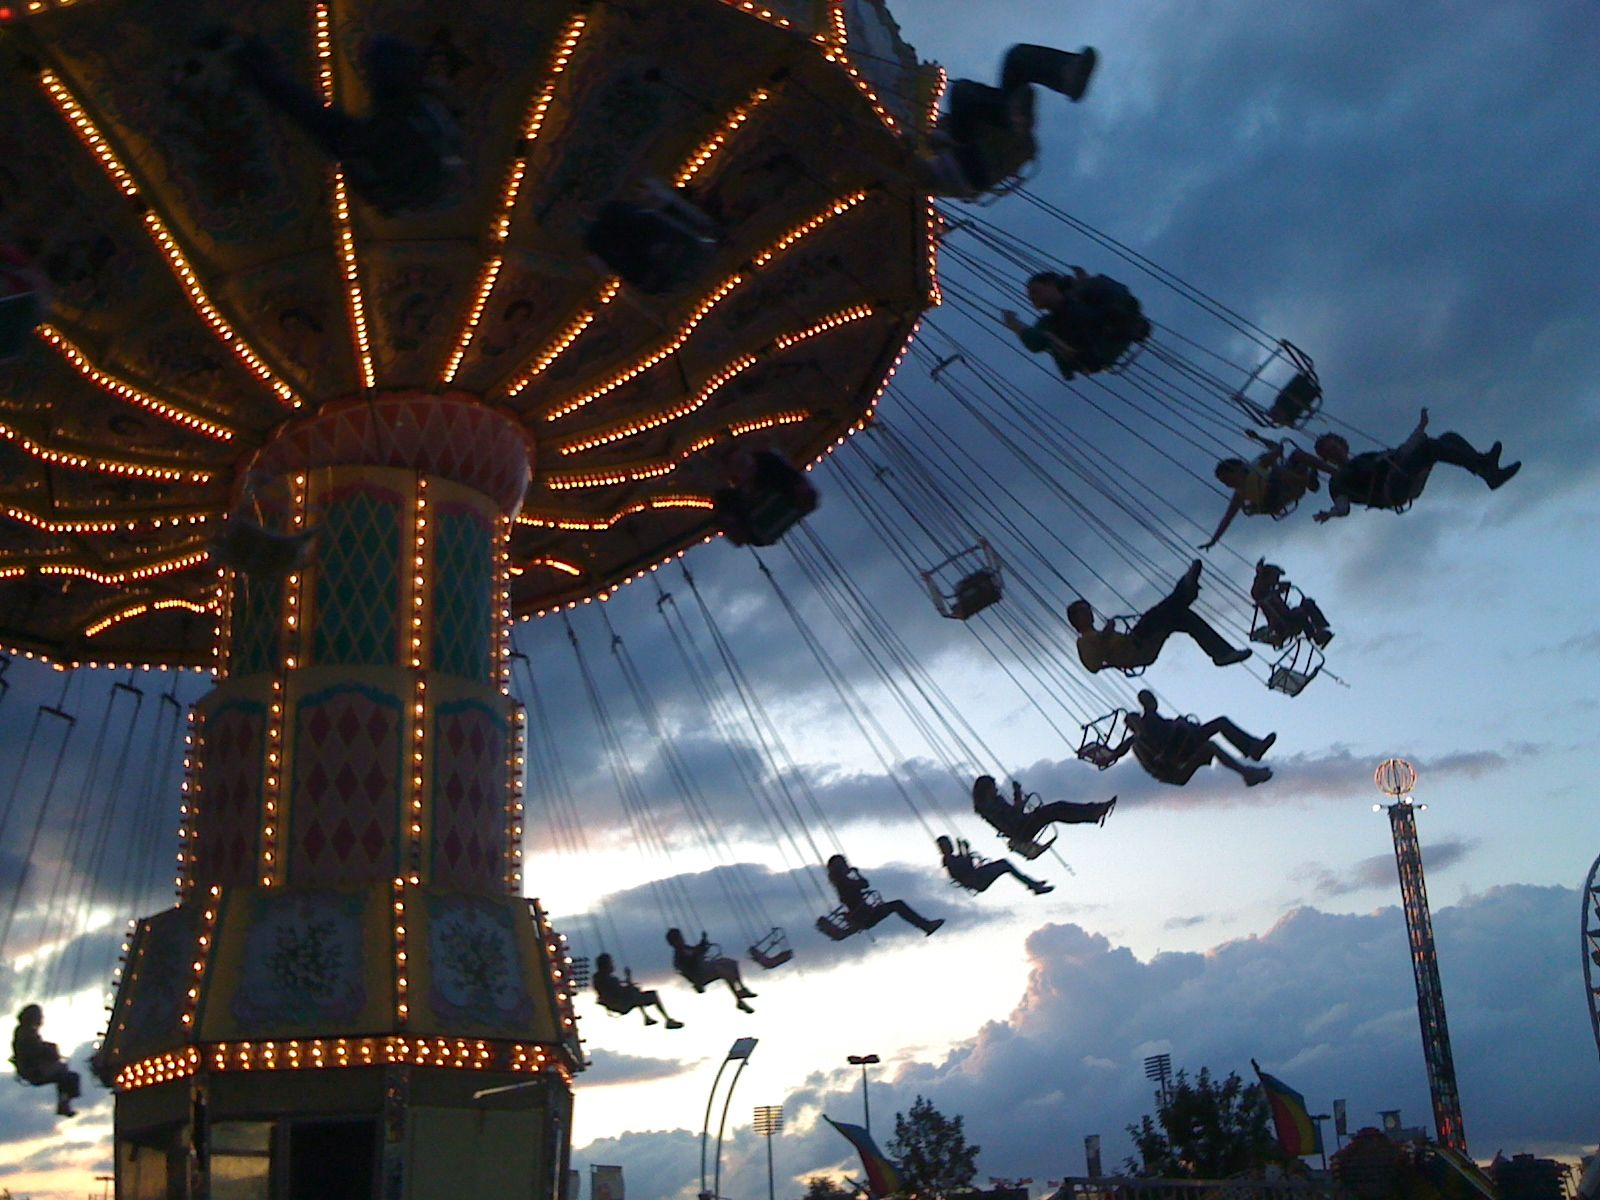 CNE Ride: Swing Ride